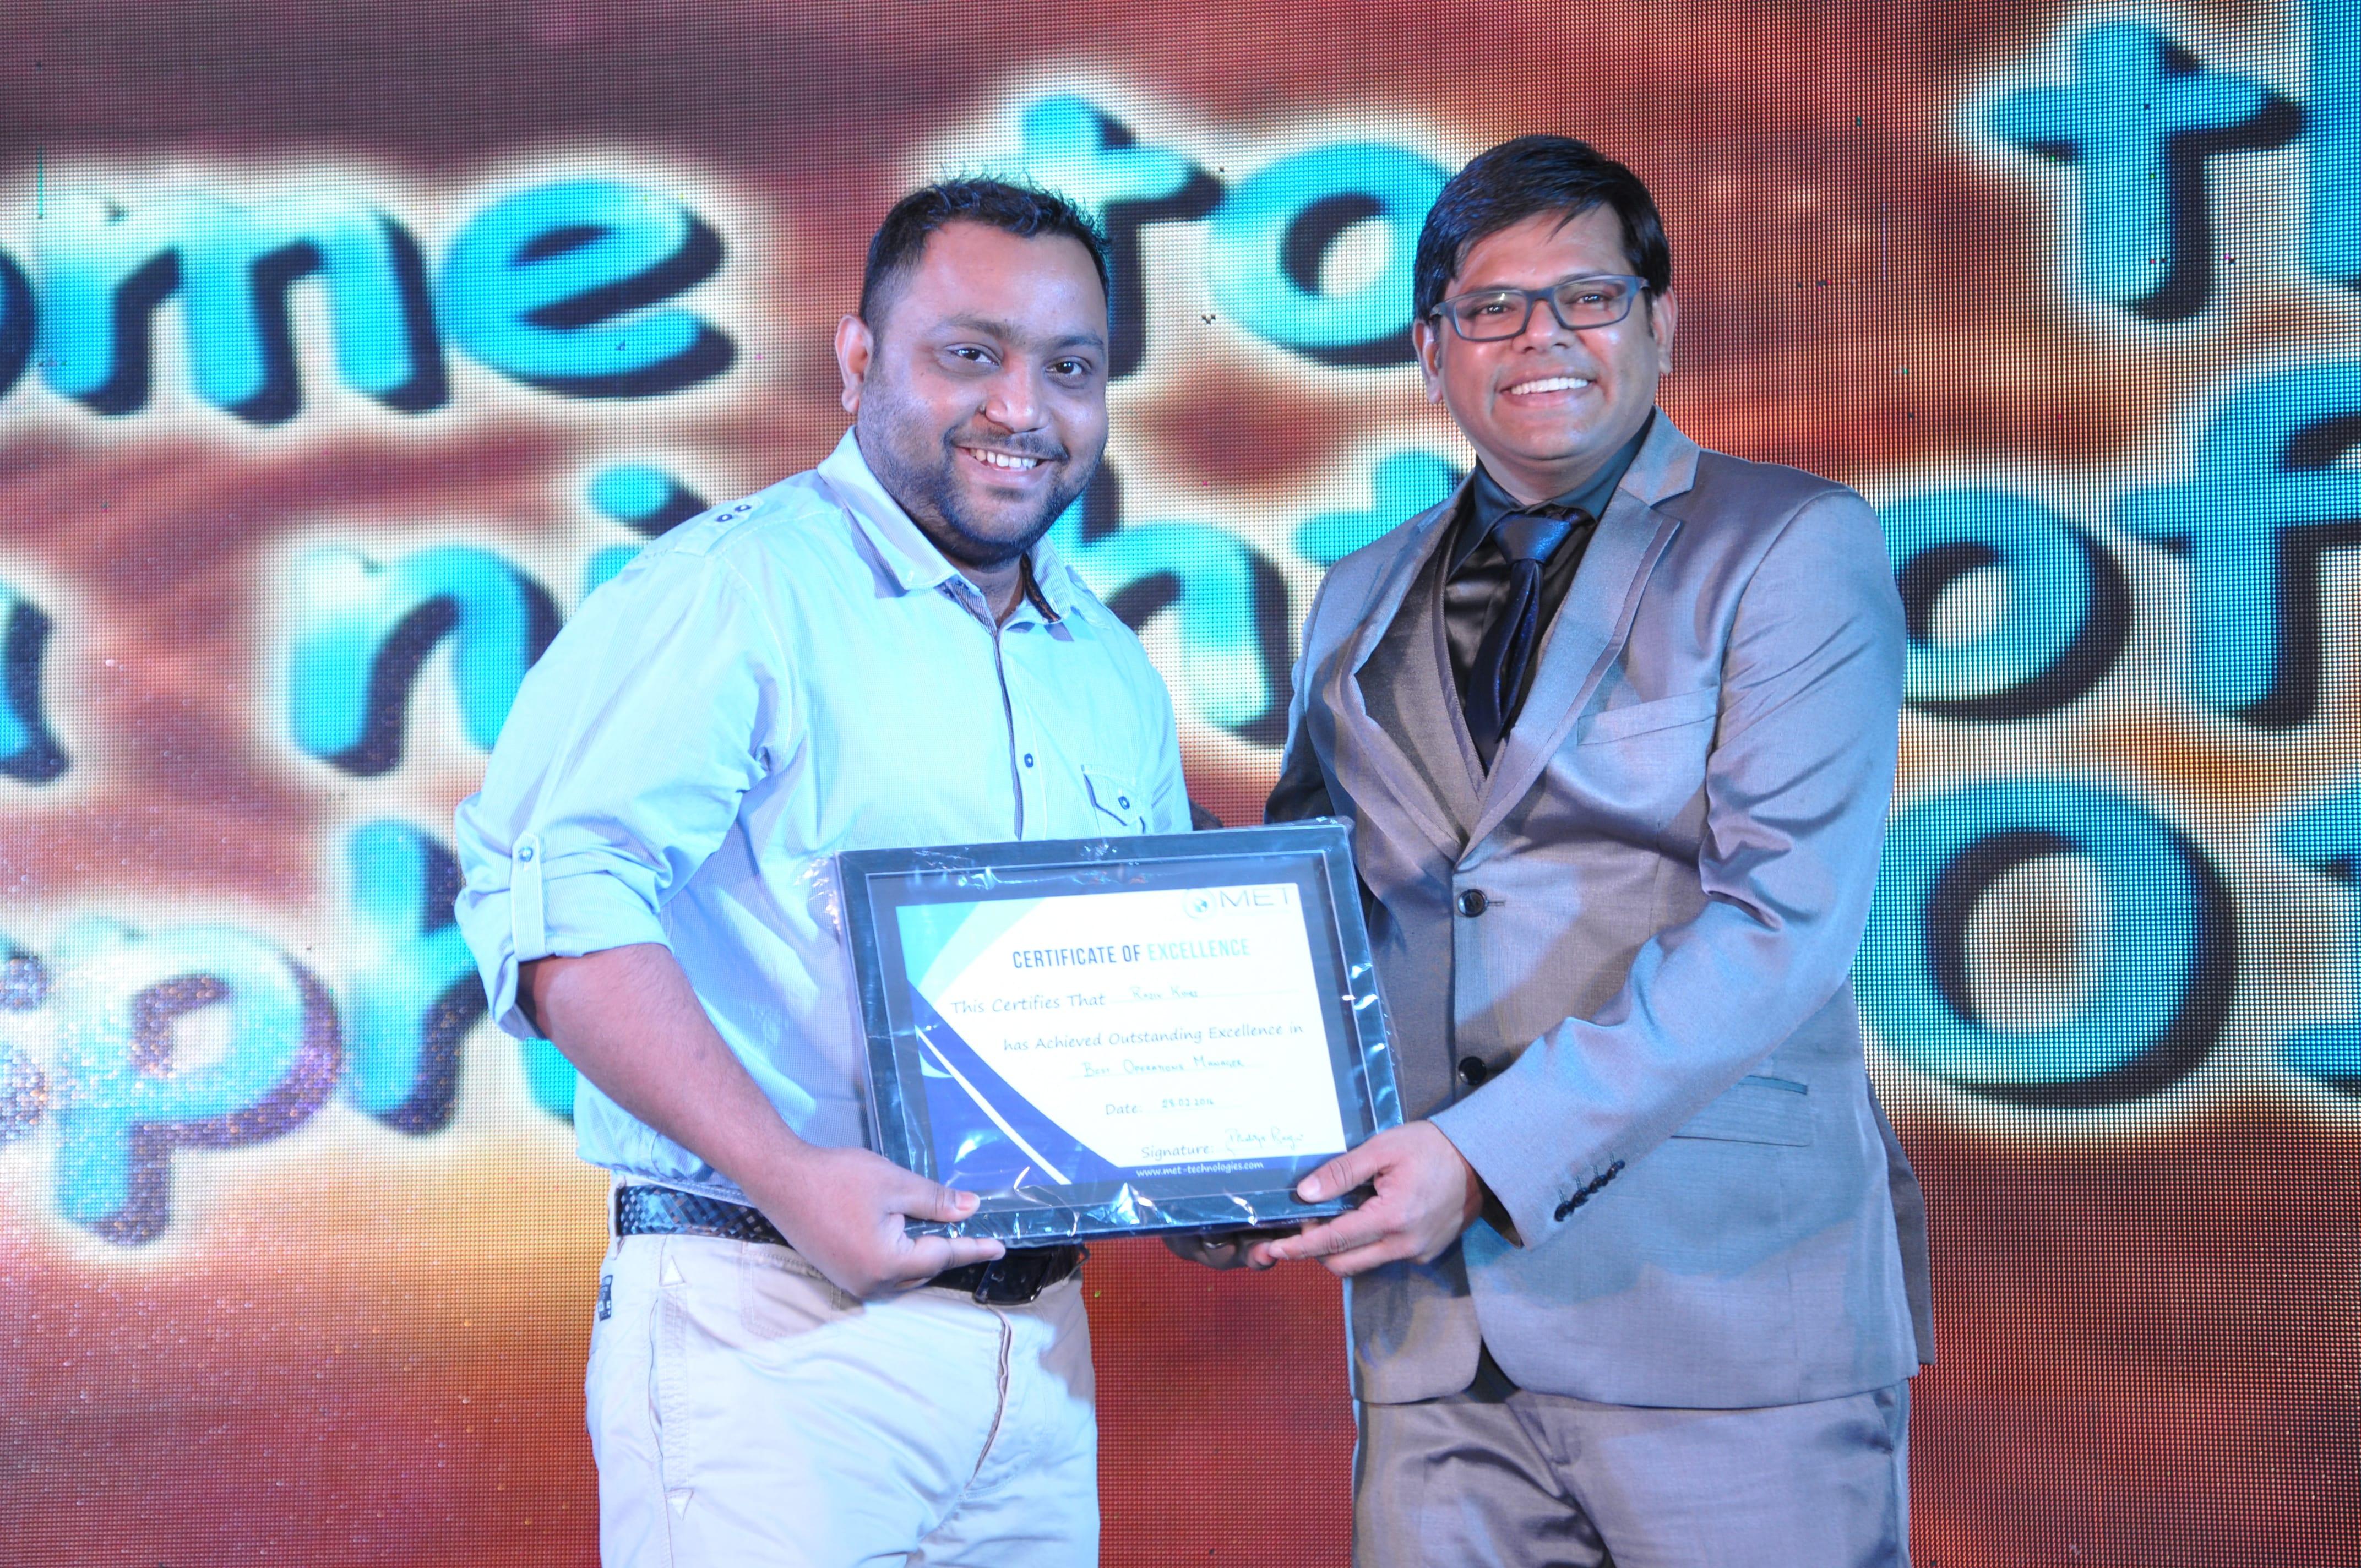 Awarded by Gaurav Gupta